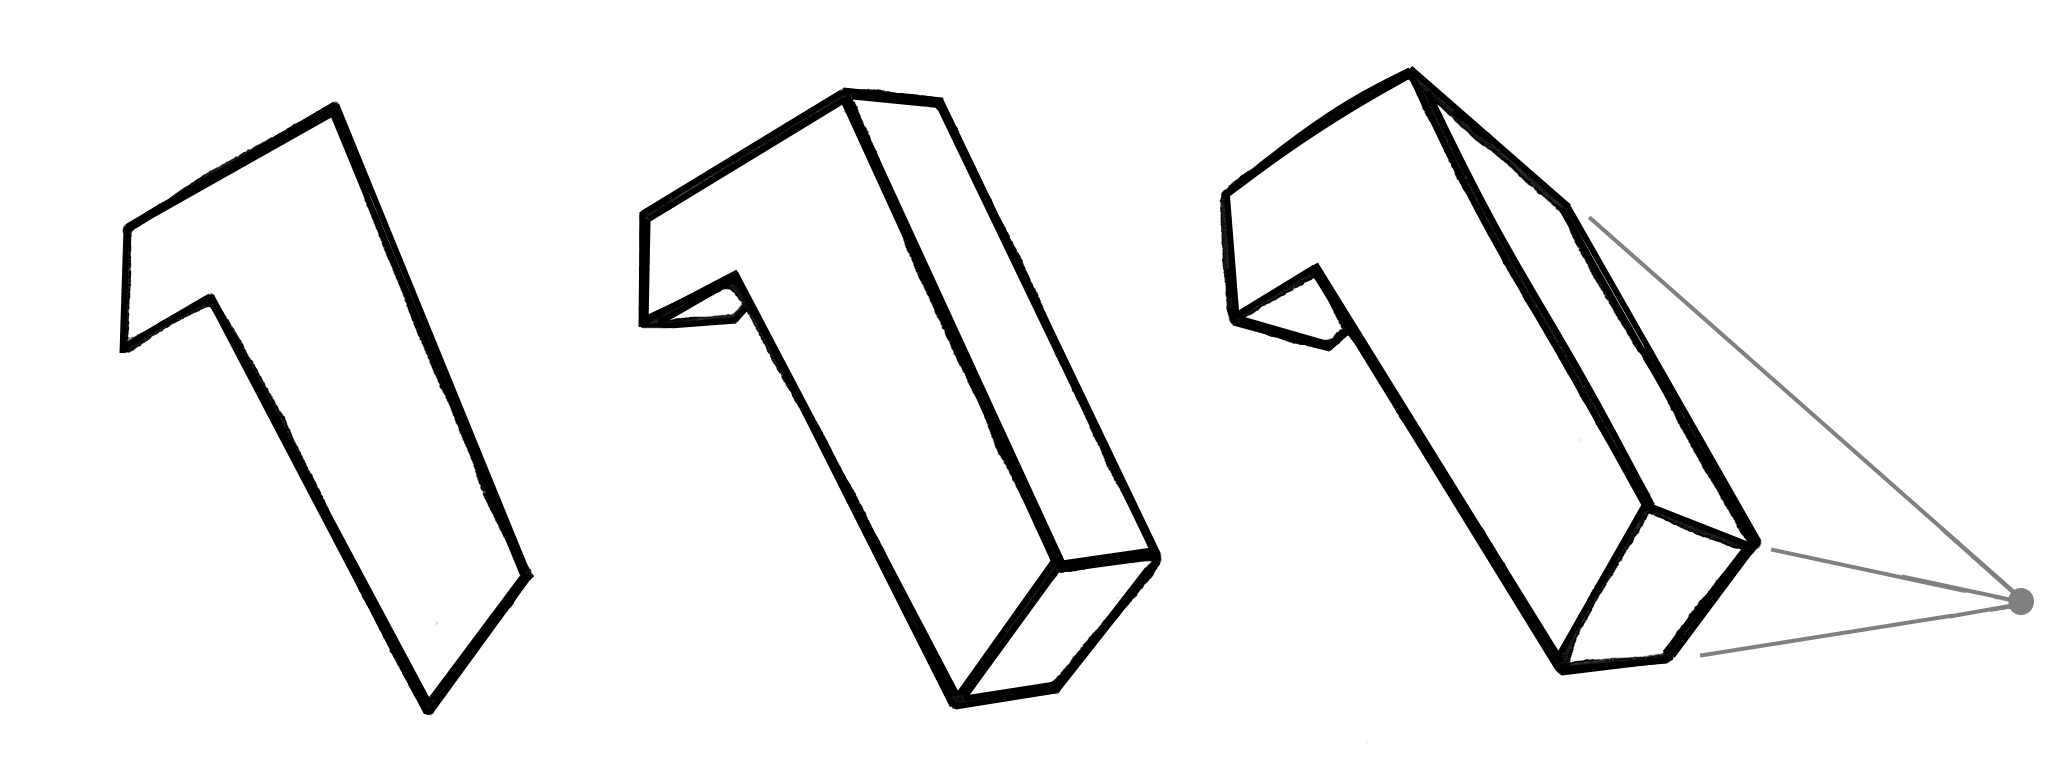 3D Tiefeneffekt